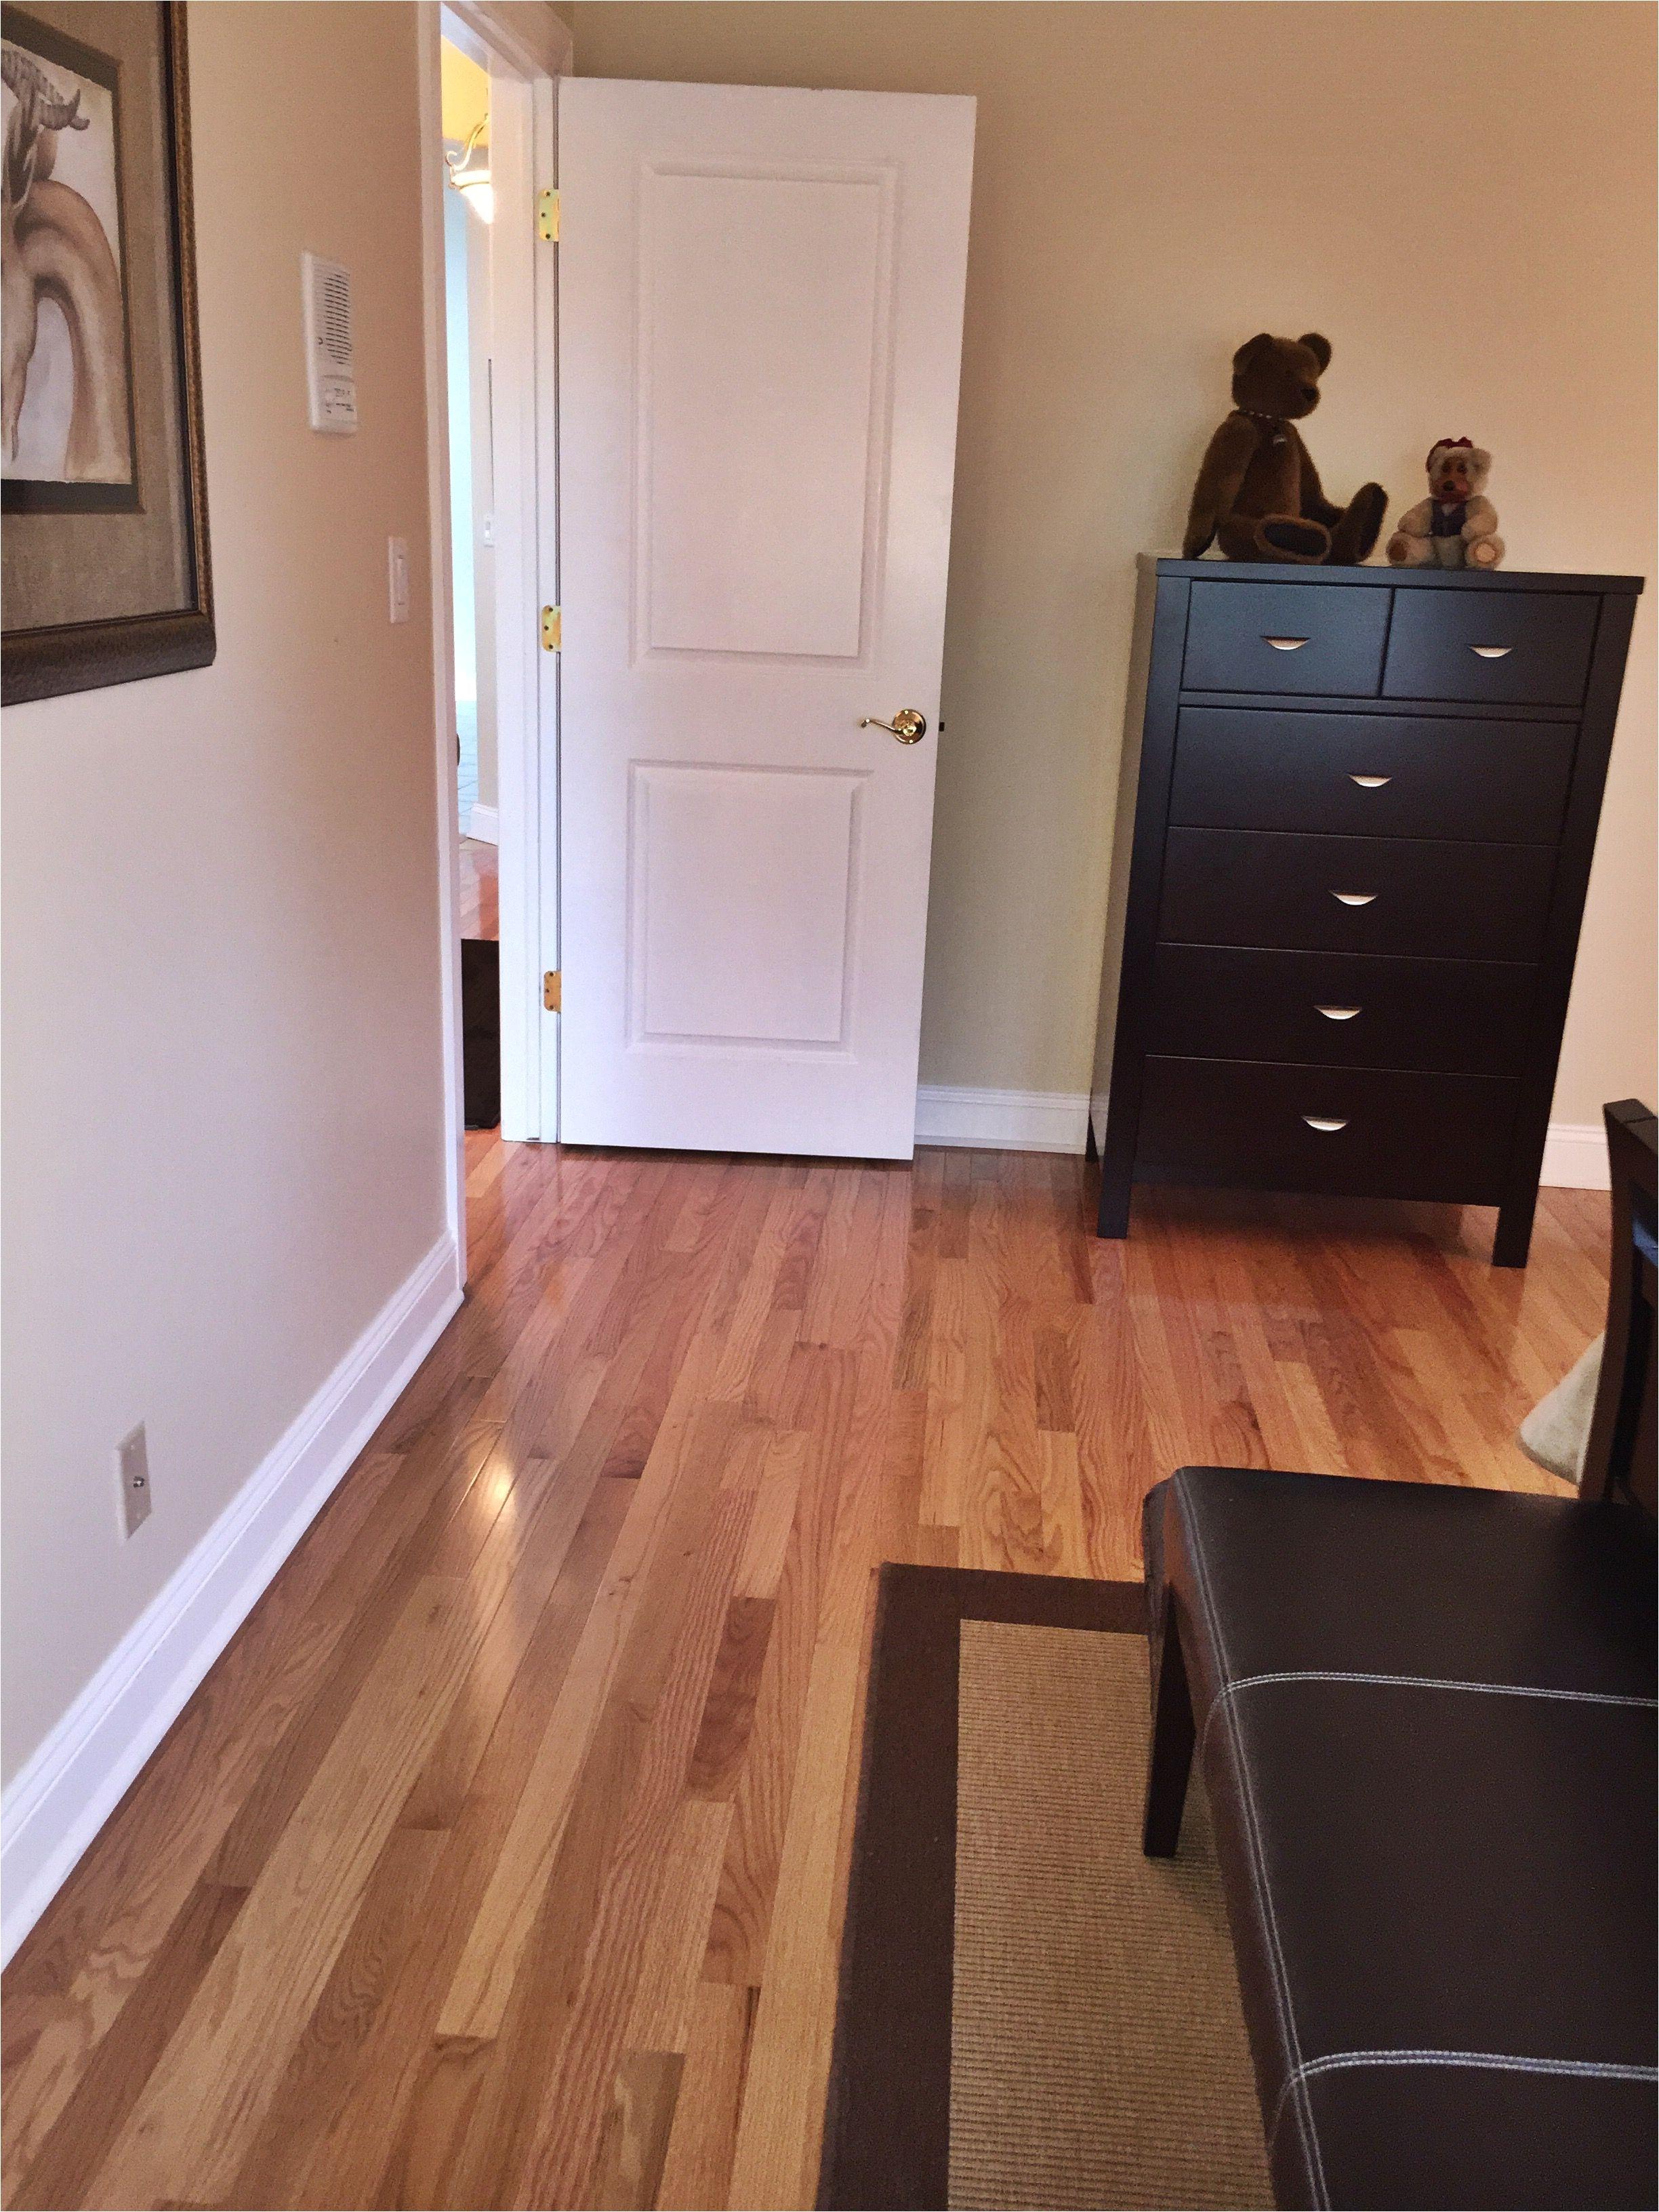 Best Cordless Vacuum for Hardwood Floors Australia Hardwood Flooring somerset High Gloss 2 1 4 Width Natural Red